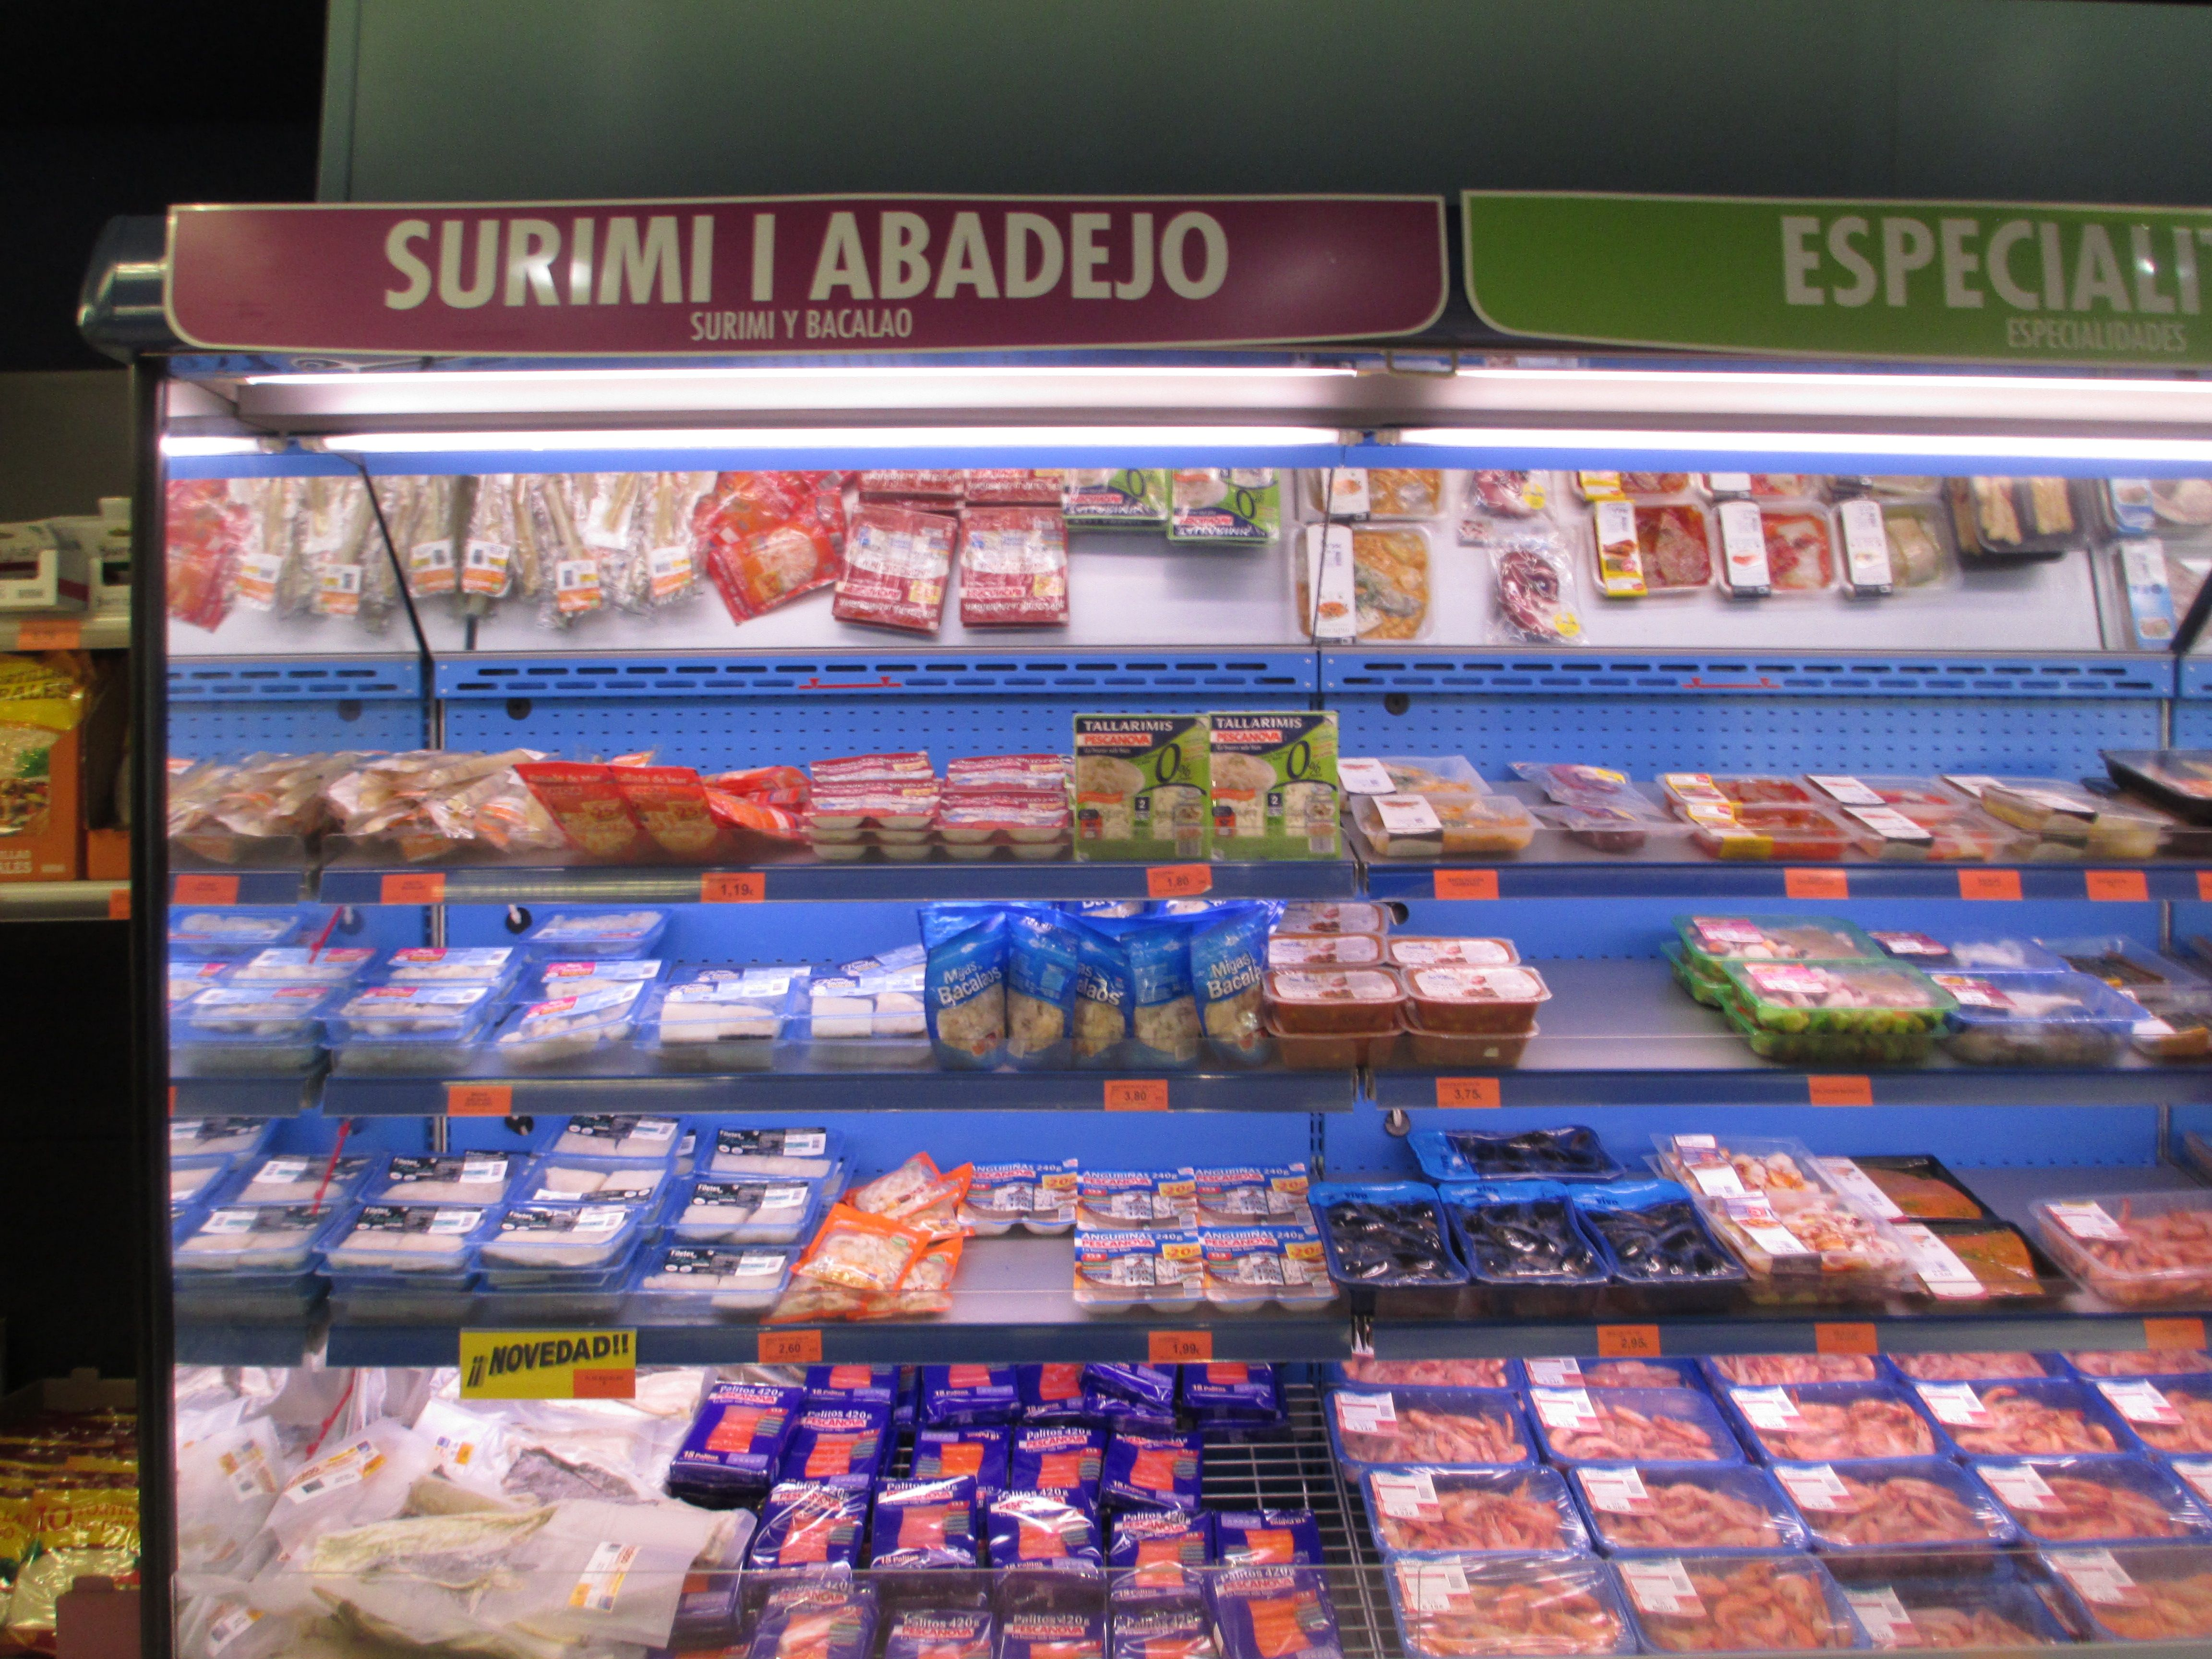 Partial Fresh Fish Display At Mercadona Grocery Store In Altea